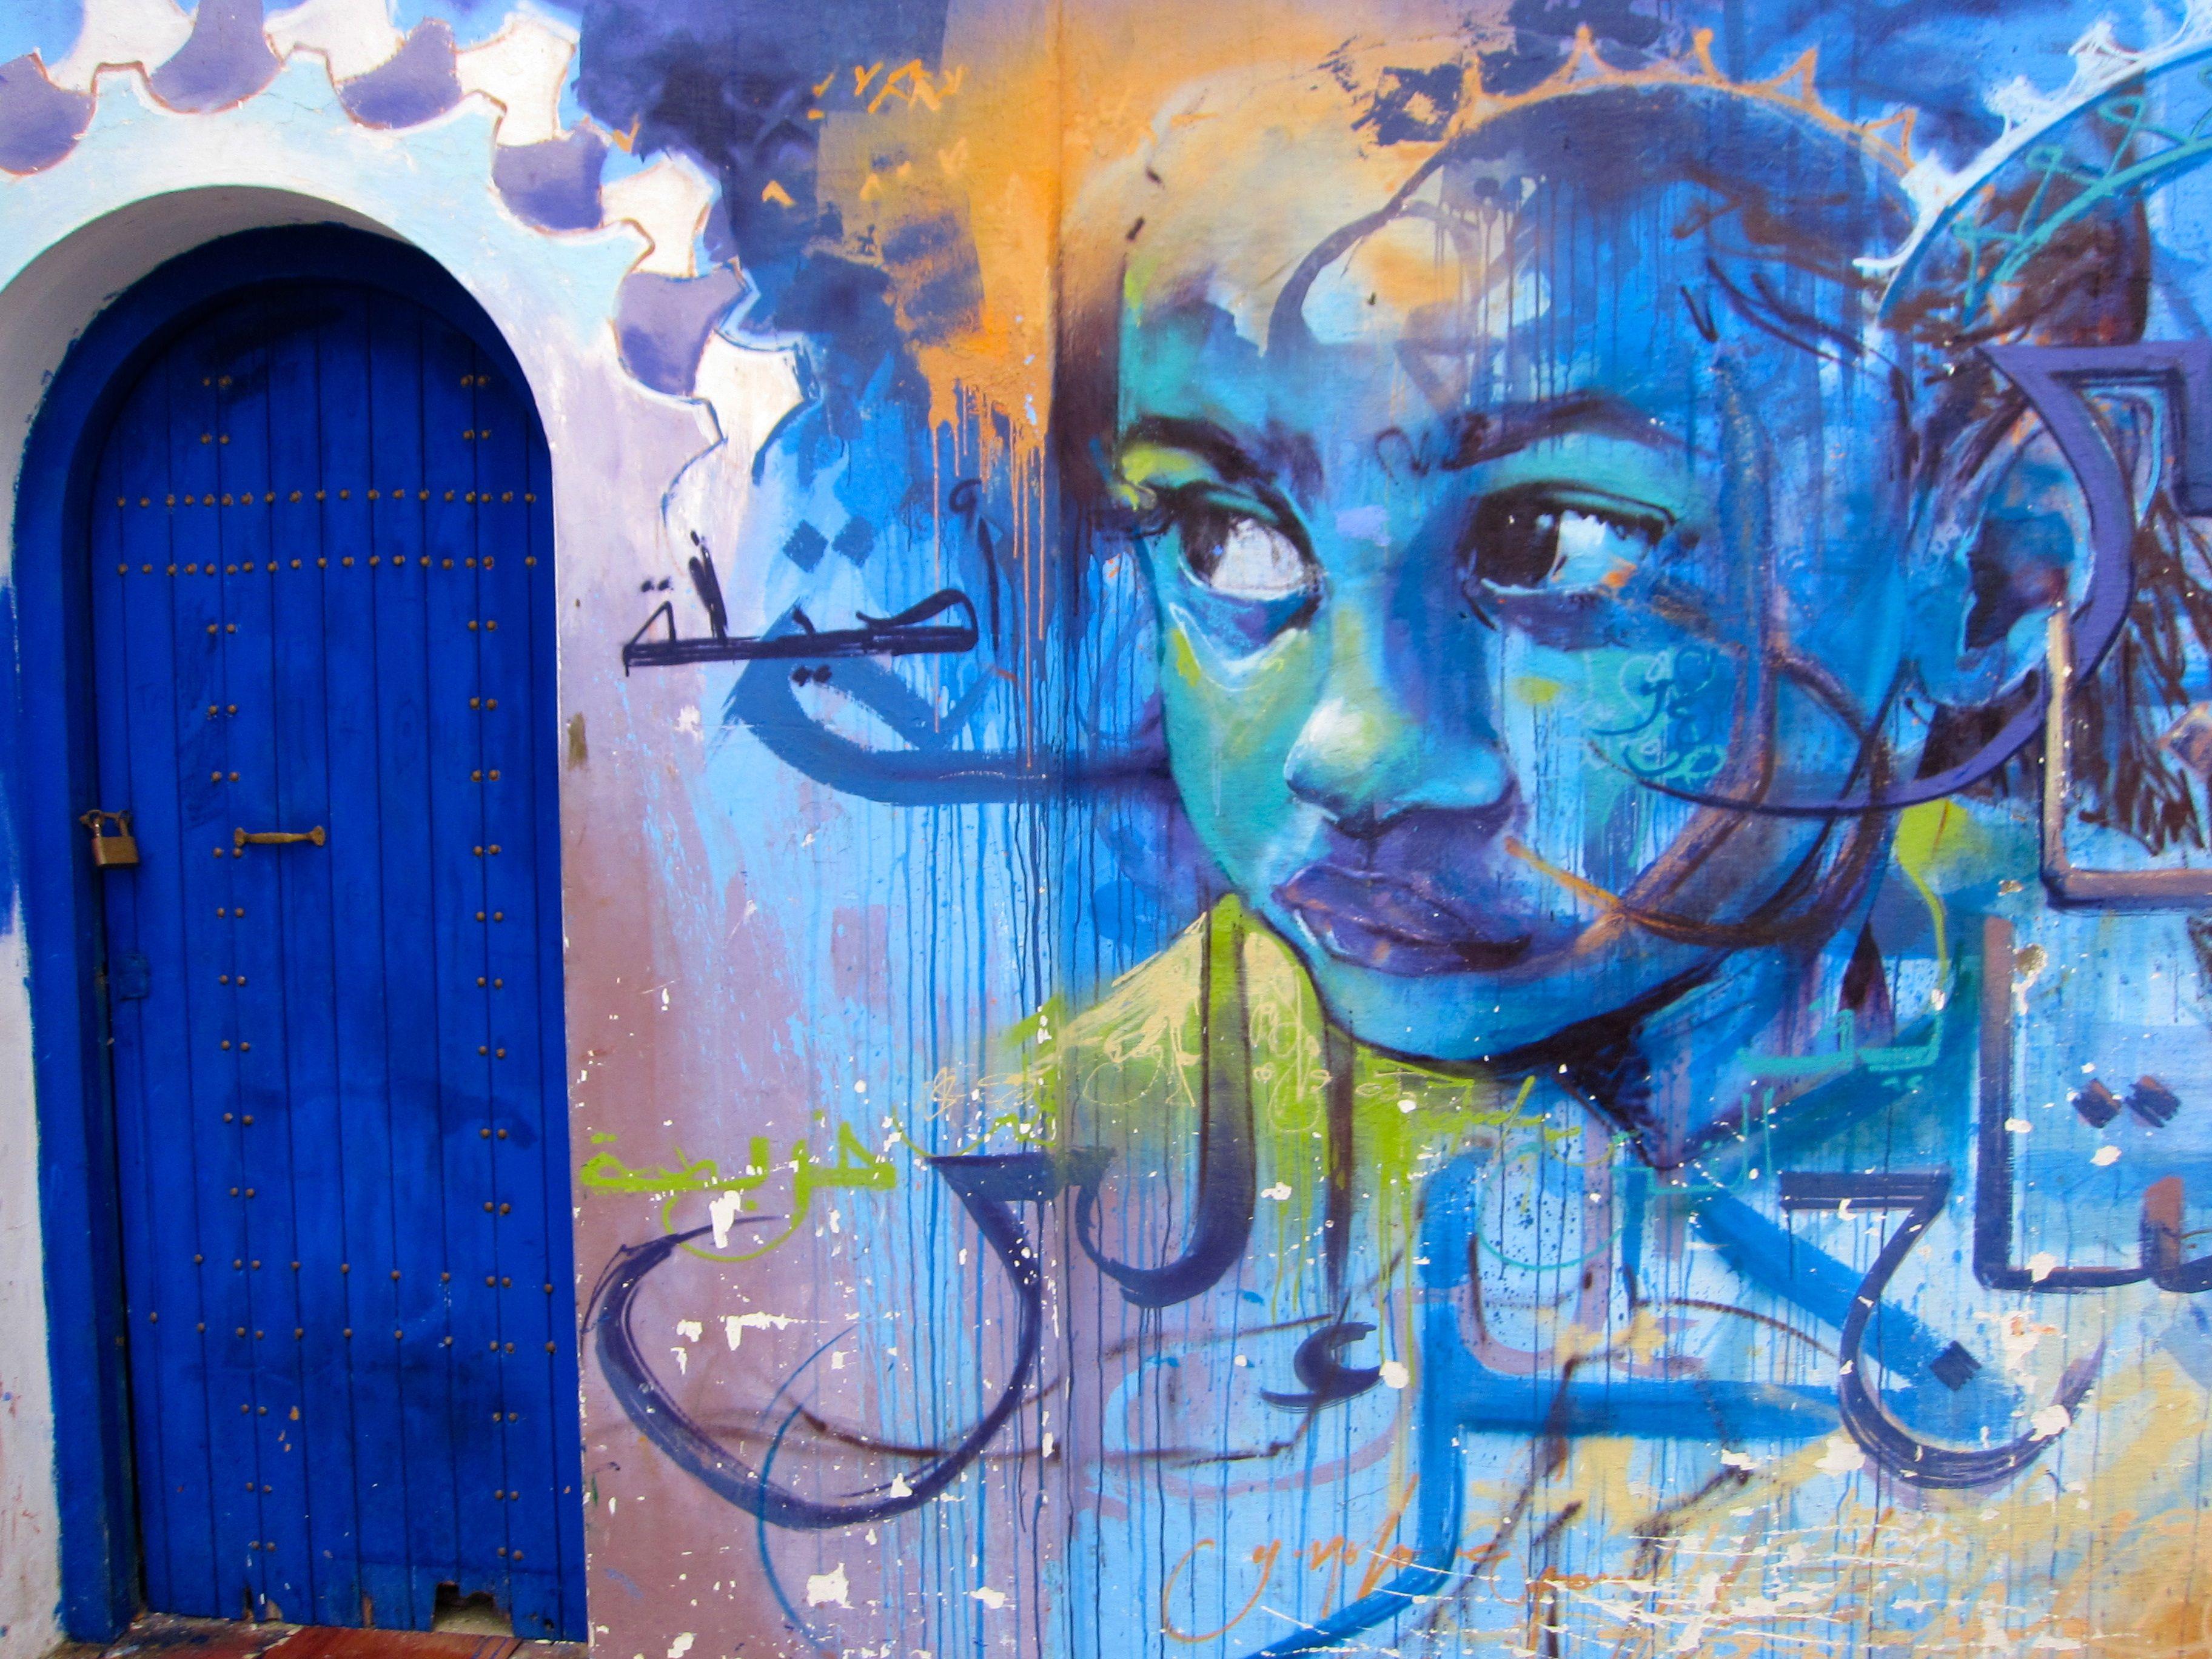 Asilah's Street Art